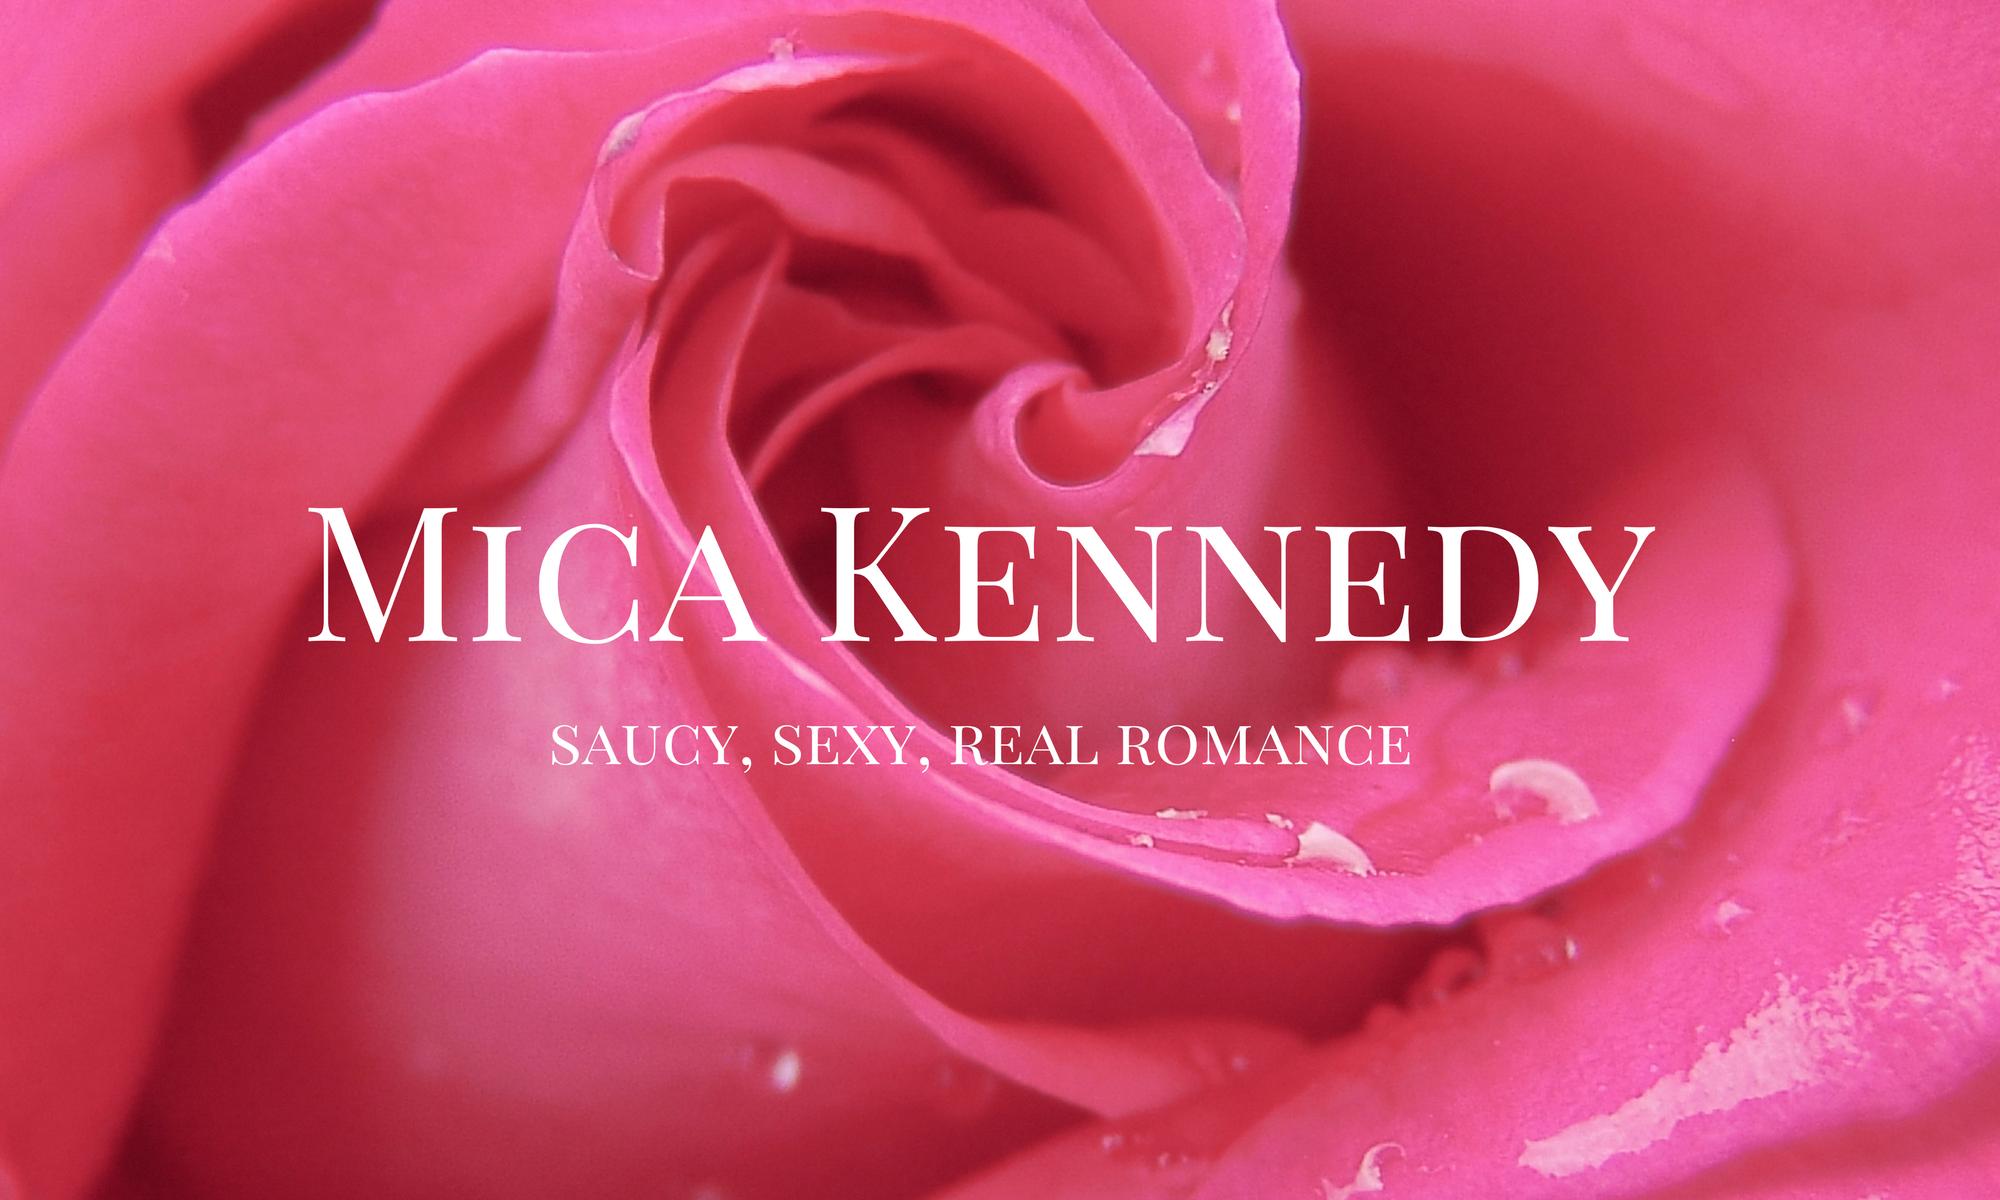 Mica Kennedy